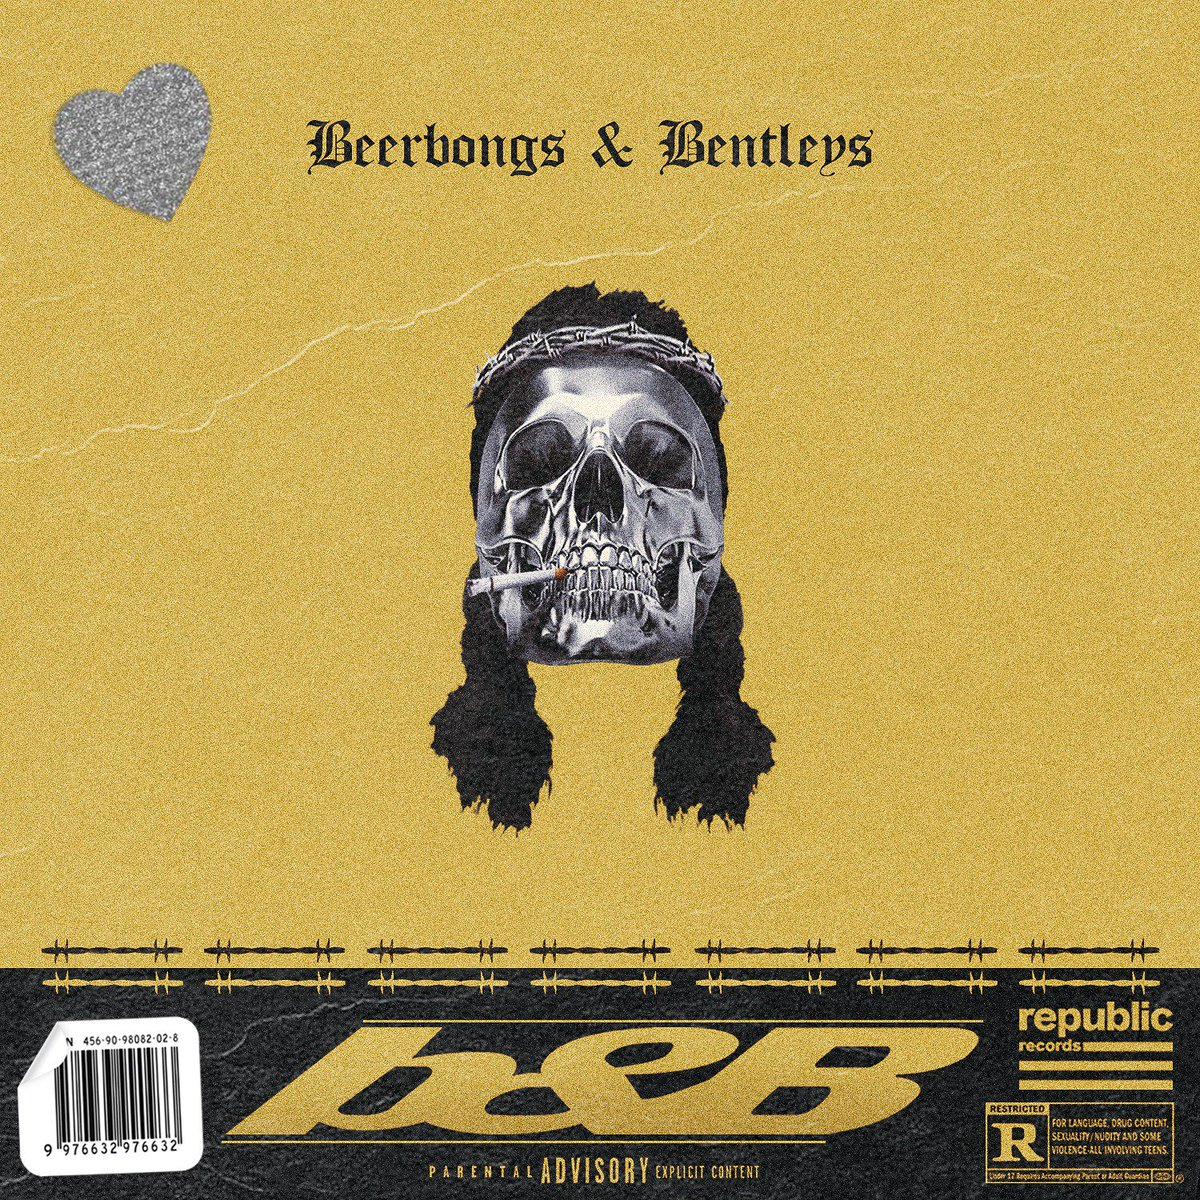 "highdemand™ on twitter: """"beerbongs & bentleys"" alternate cover"